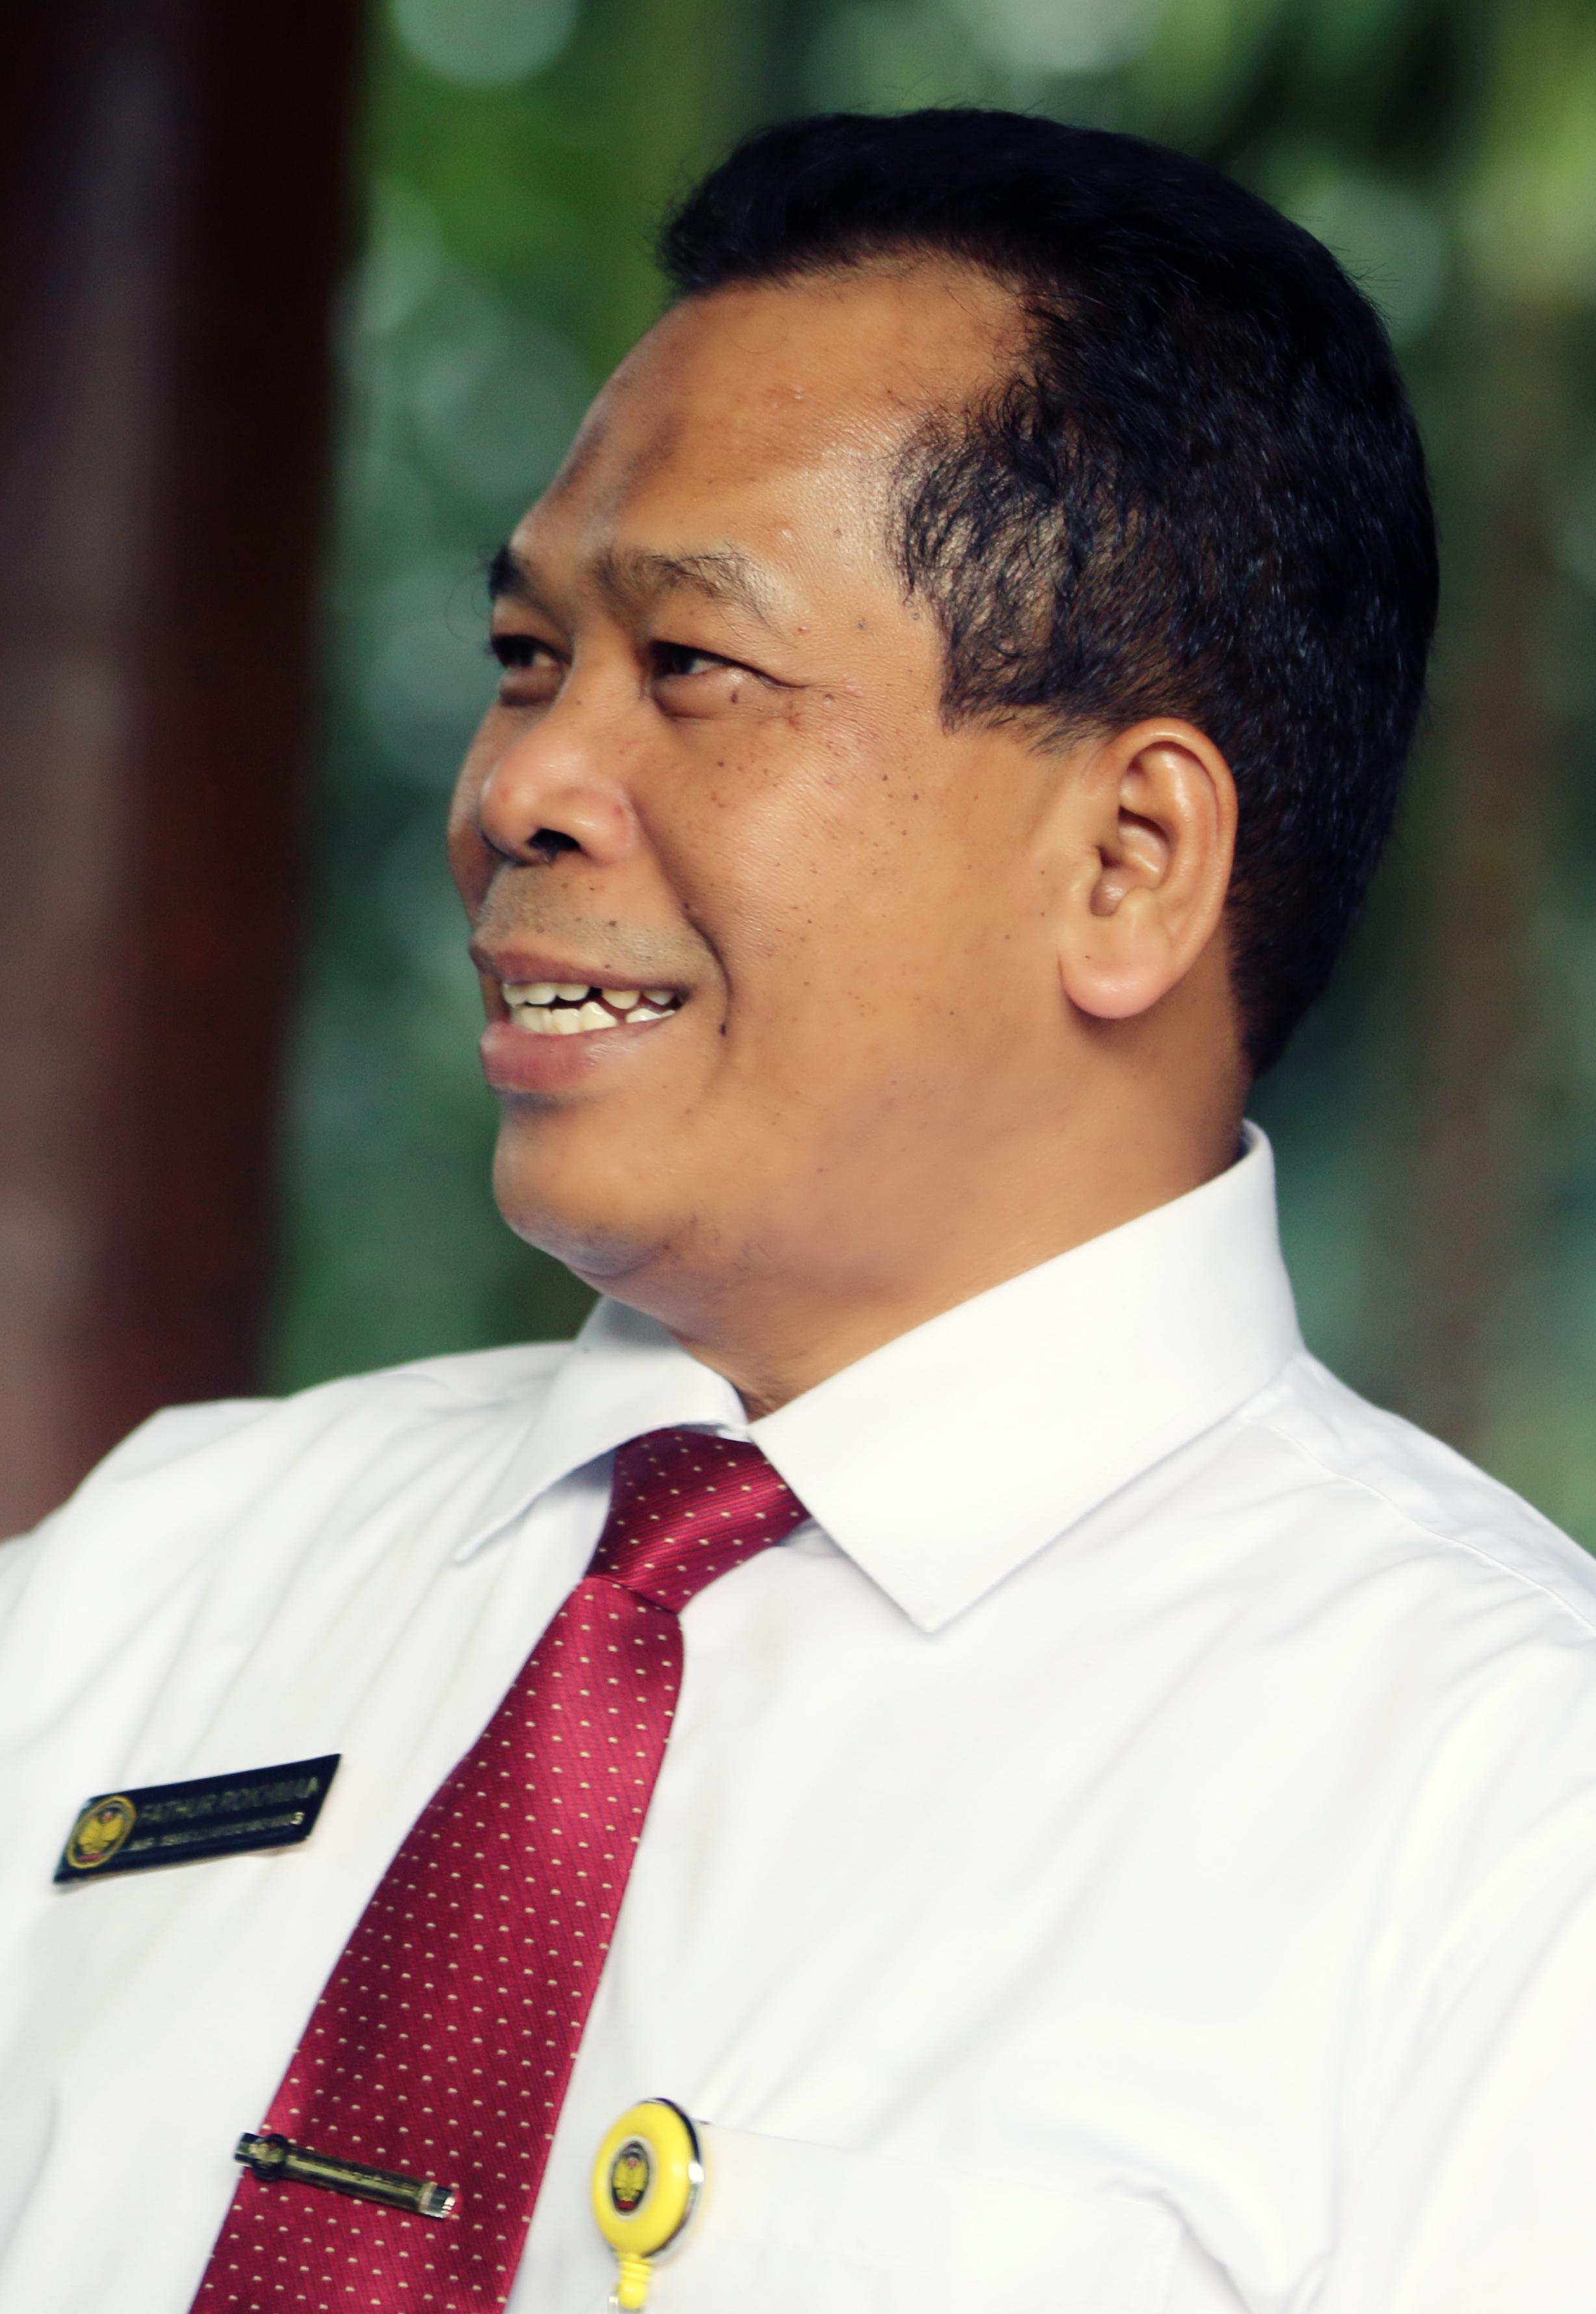 Rektor Ajak Warga Unnes Doakan Anggun Korban Bom Sarinah